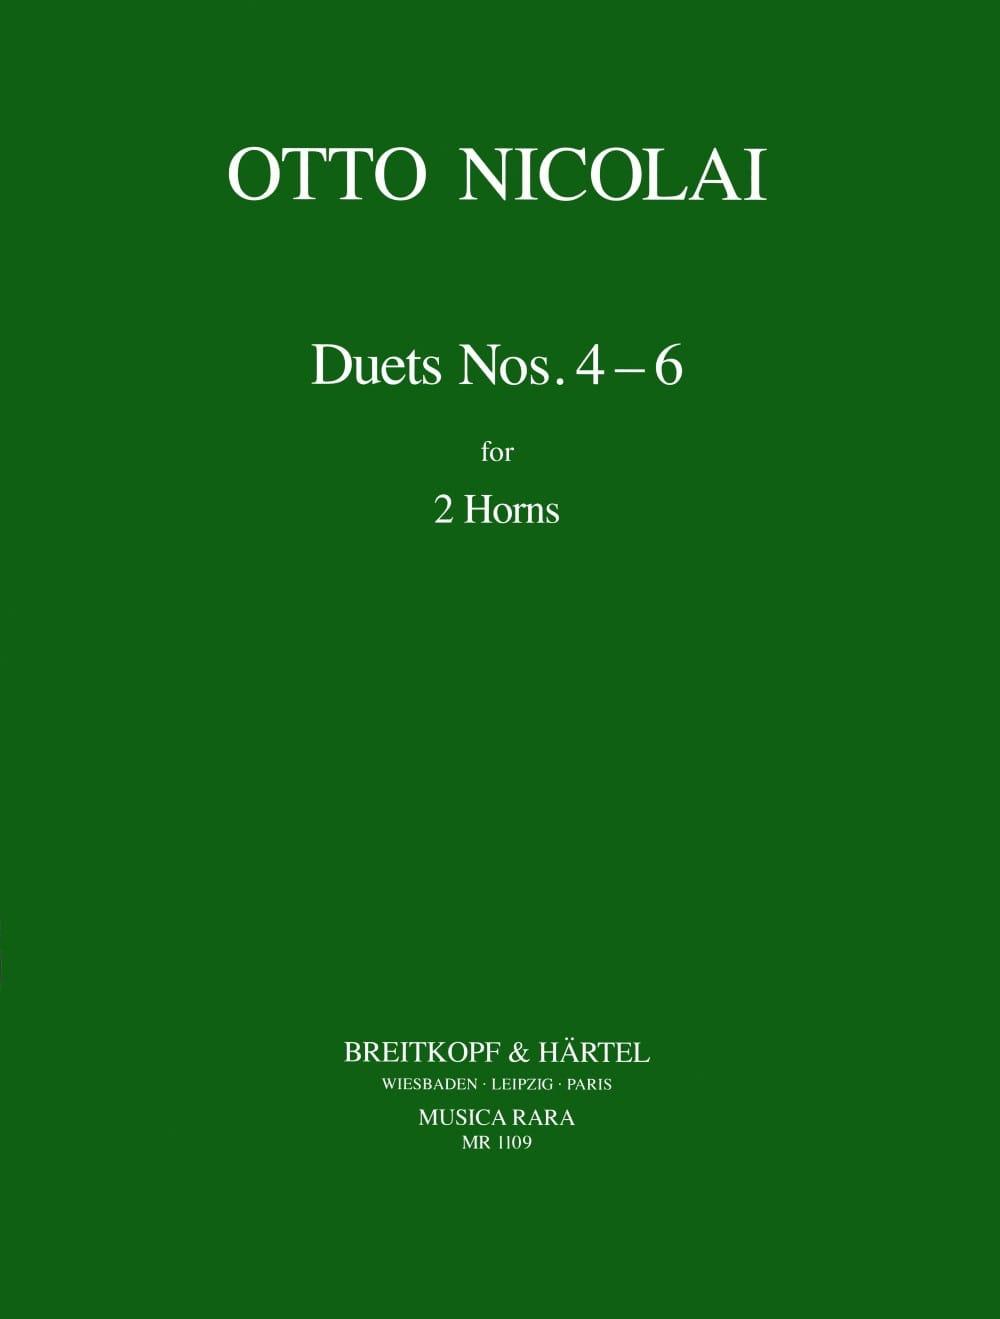 Duets N° 4, 5 & 6 - Otto Nicolai - Partition - Cor - laflutedepan.com